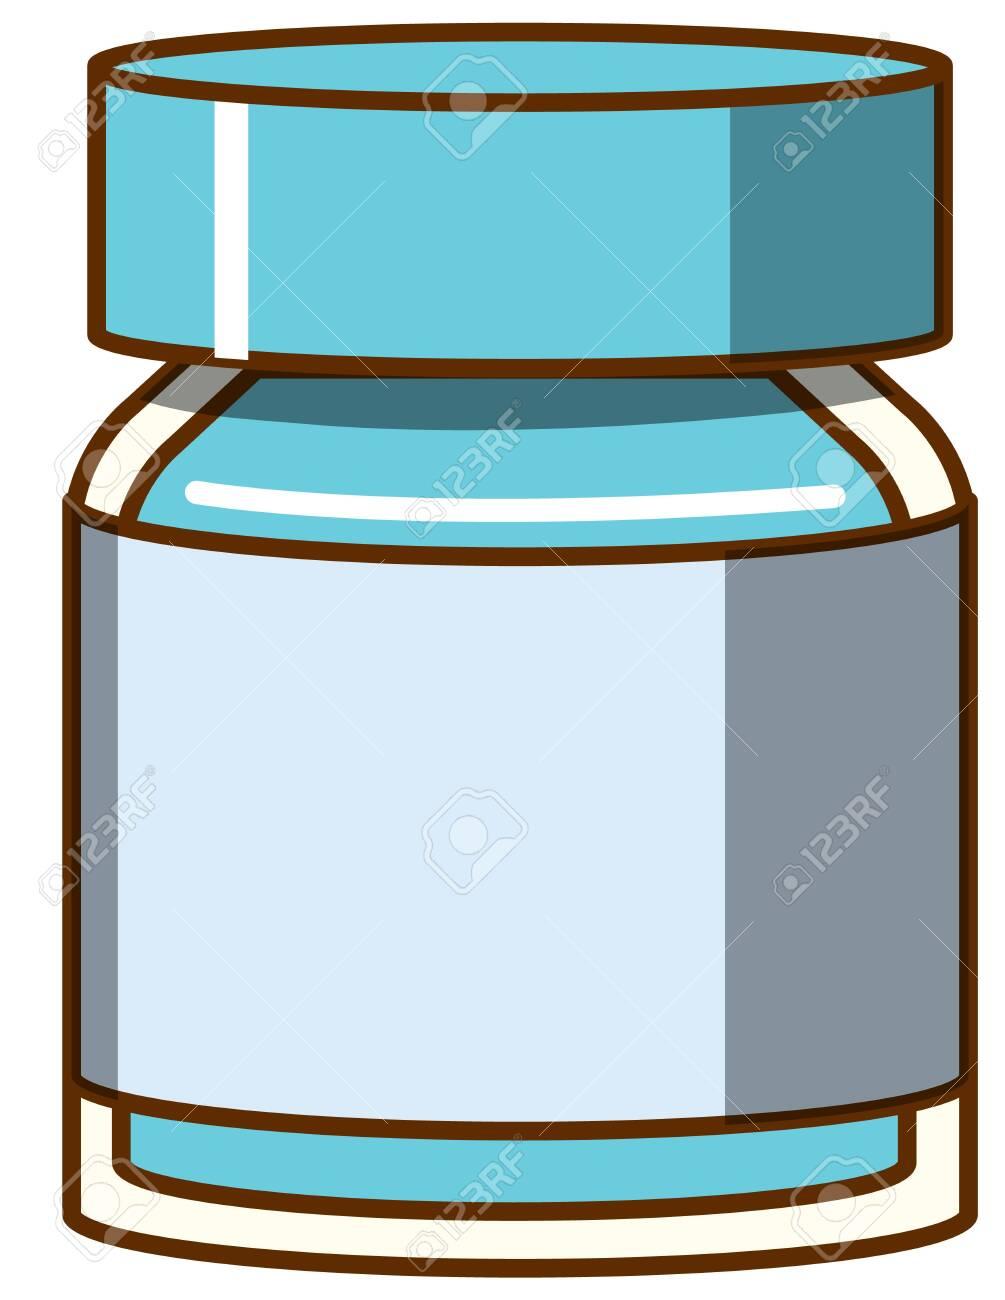 Blue watercolor in bottle on white background illustration - 147784170